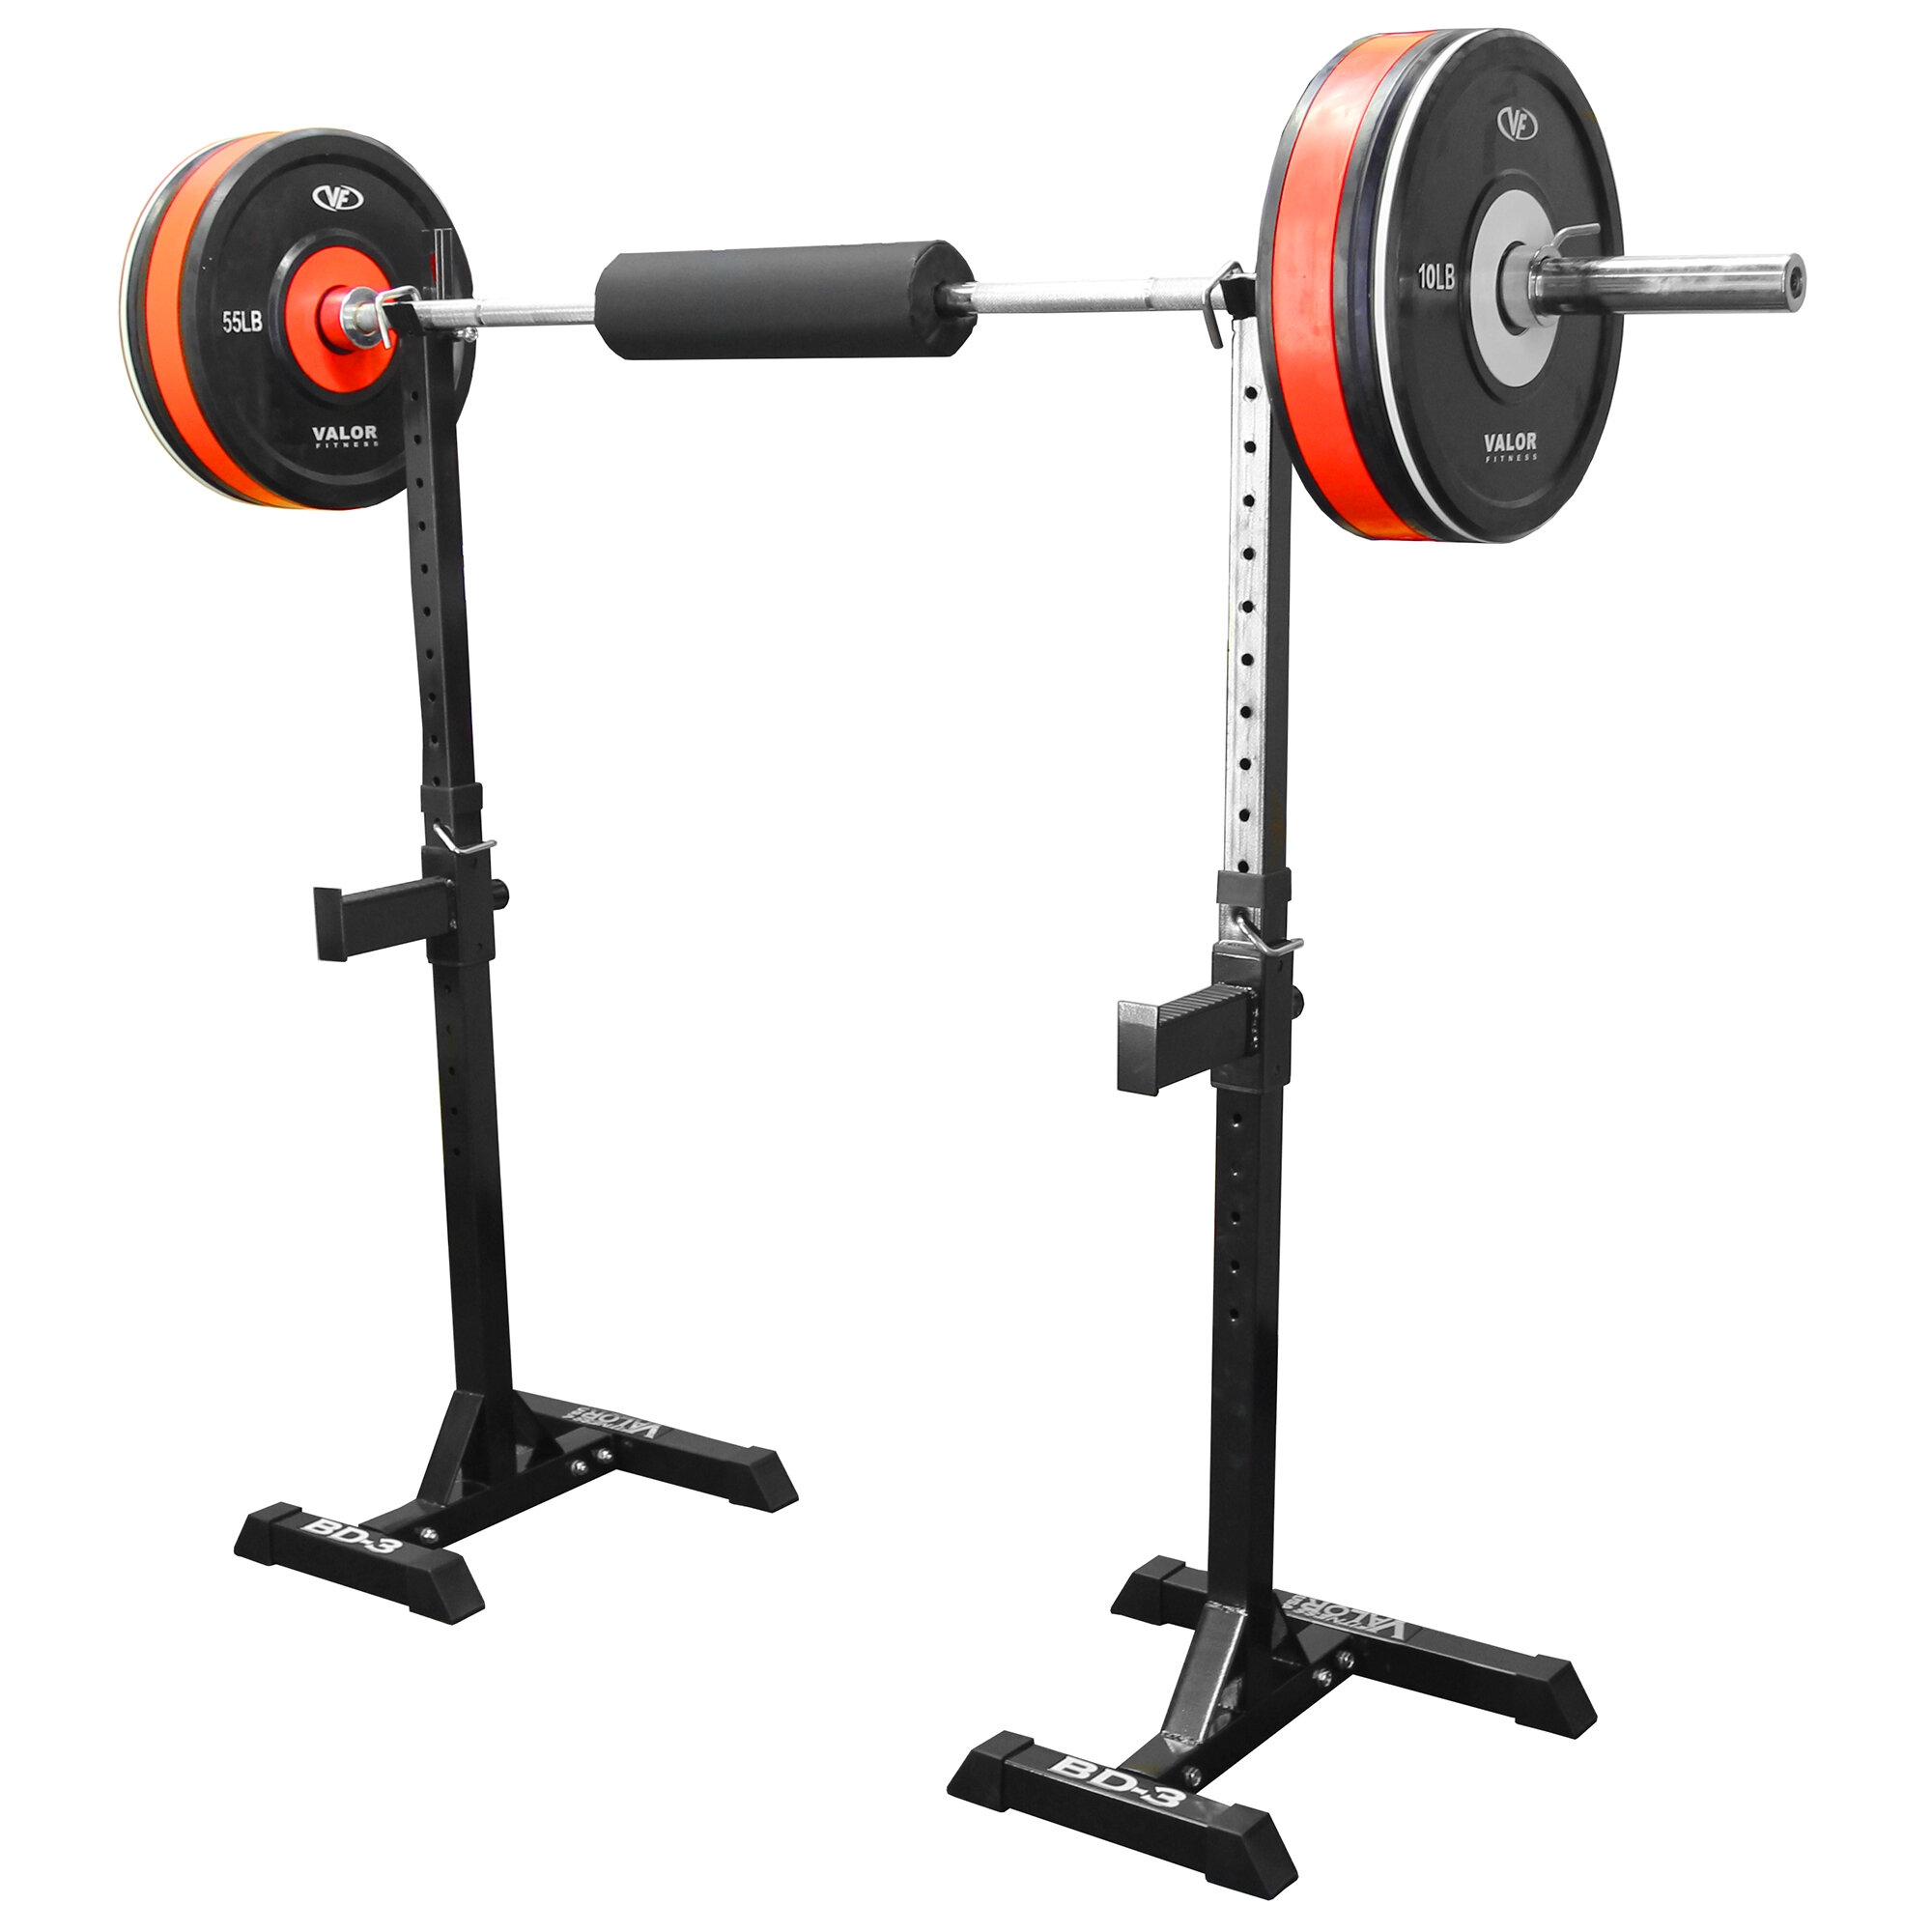 Strength Power Lifting Squat Rack Valor Fitness Bench